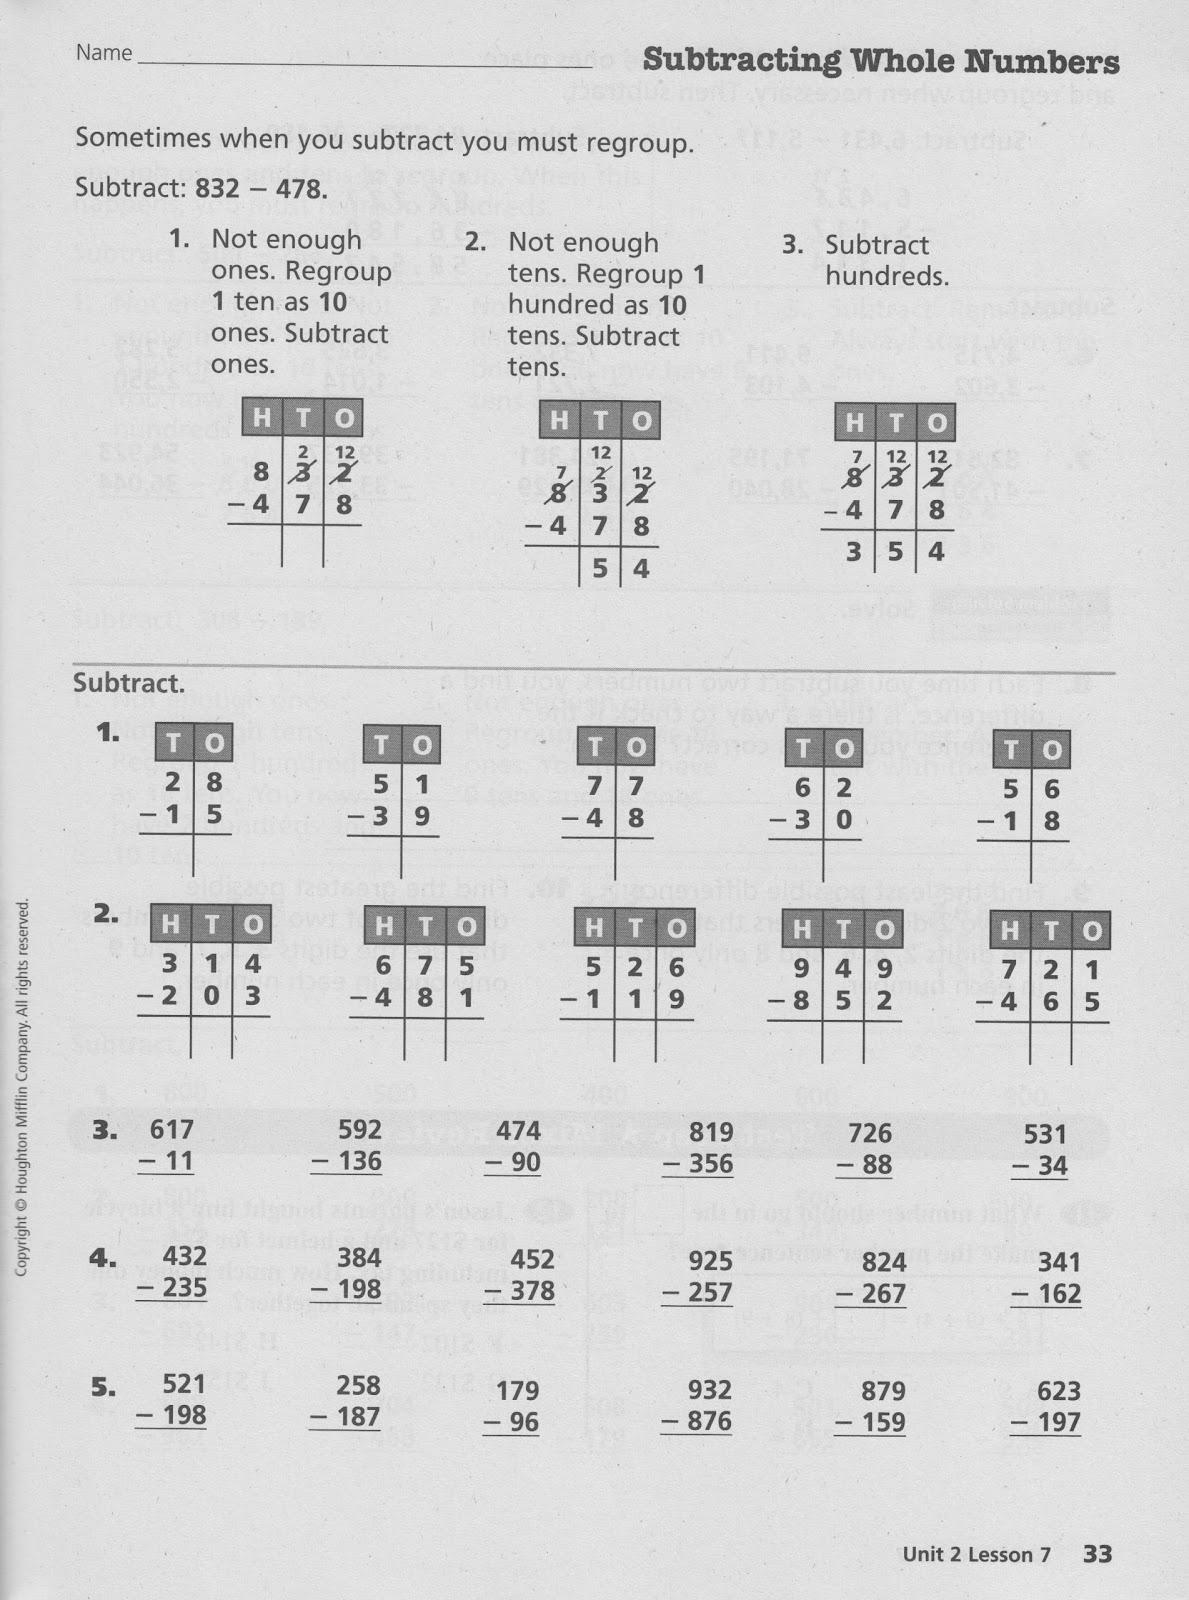 Homework Tuesday September 11th